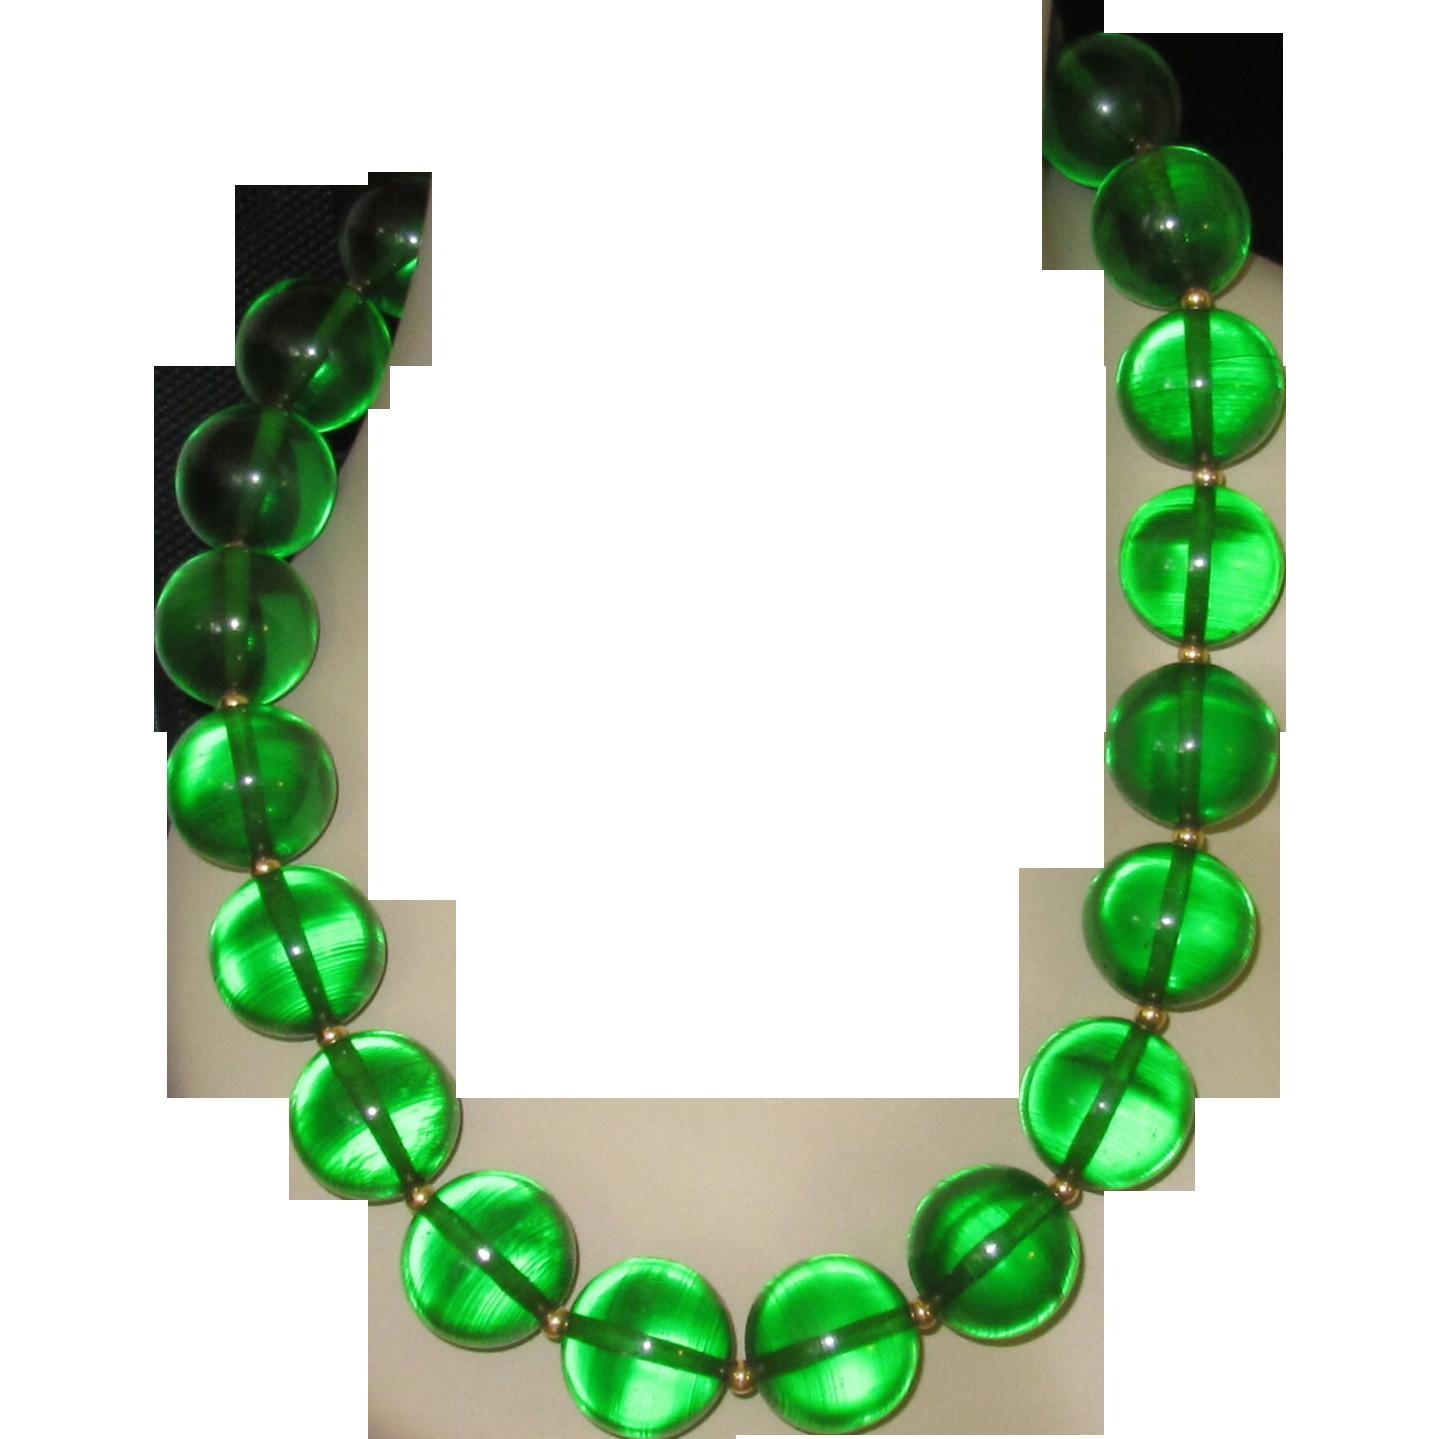 Vintage Huge Prystal Bakelite Beads Necklace